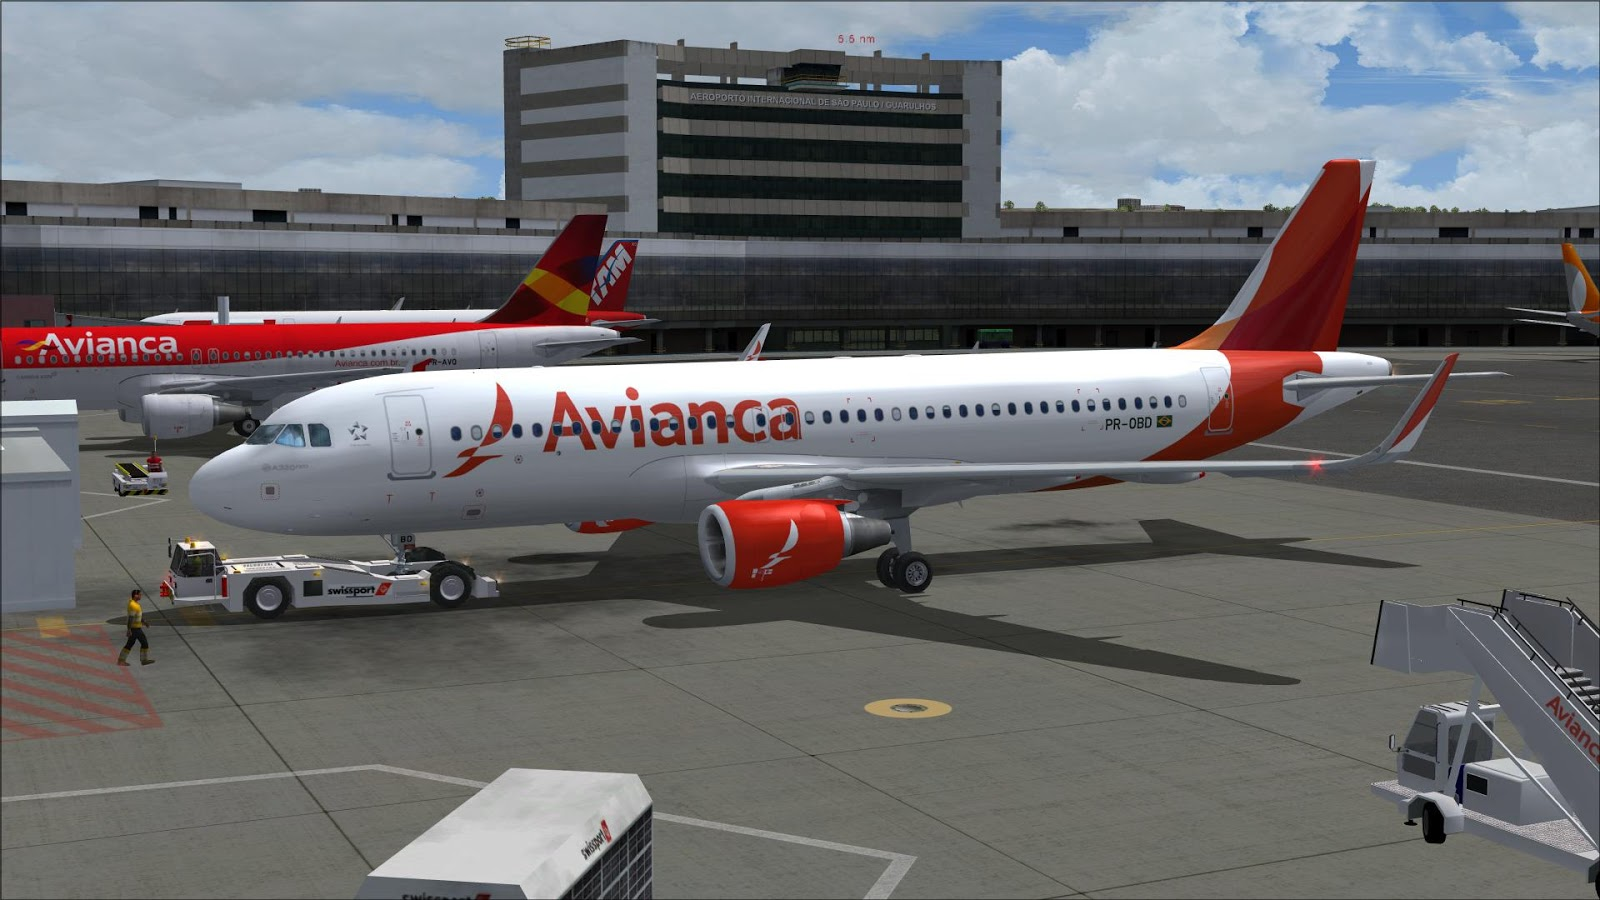 FSRepainter: PROJECT AIRBUS A320-200Neo AVIANCA Brazil PR-OBD